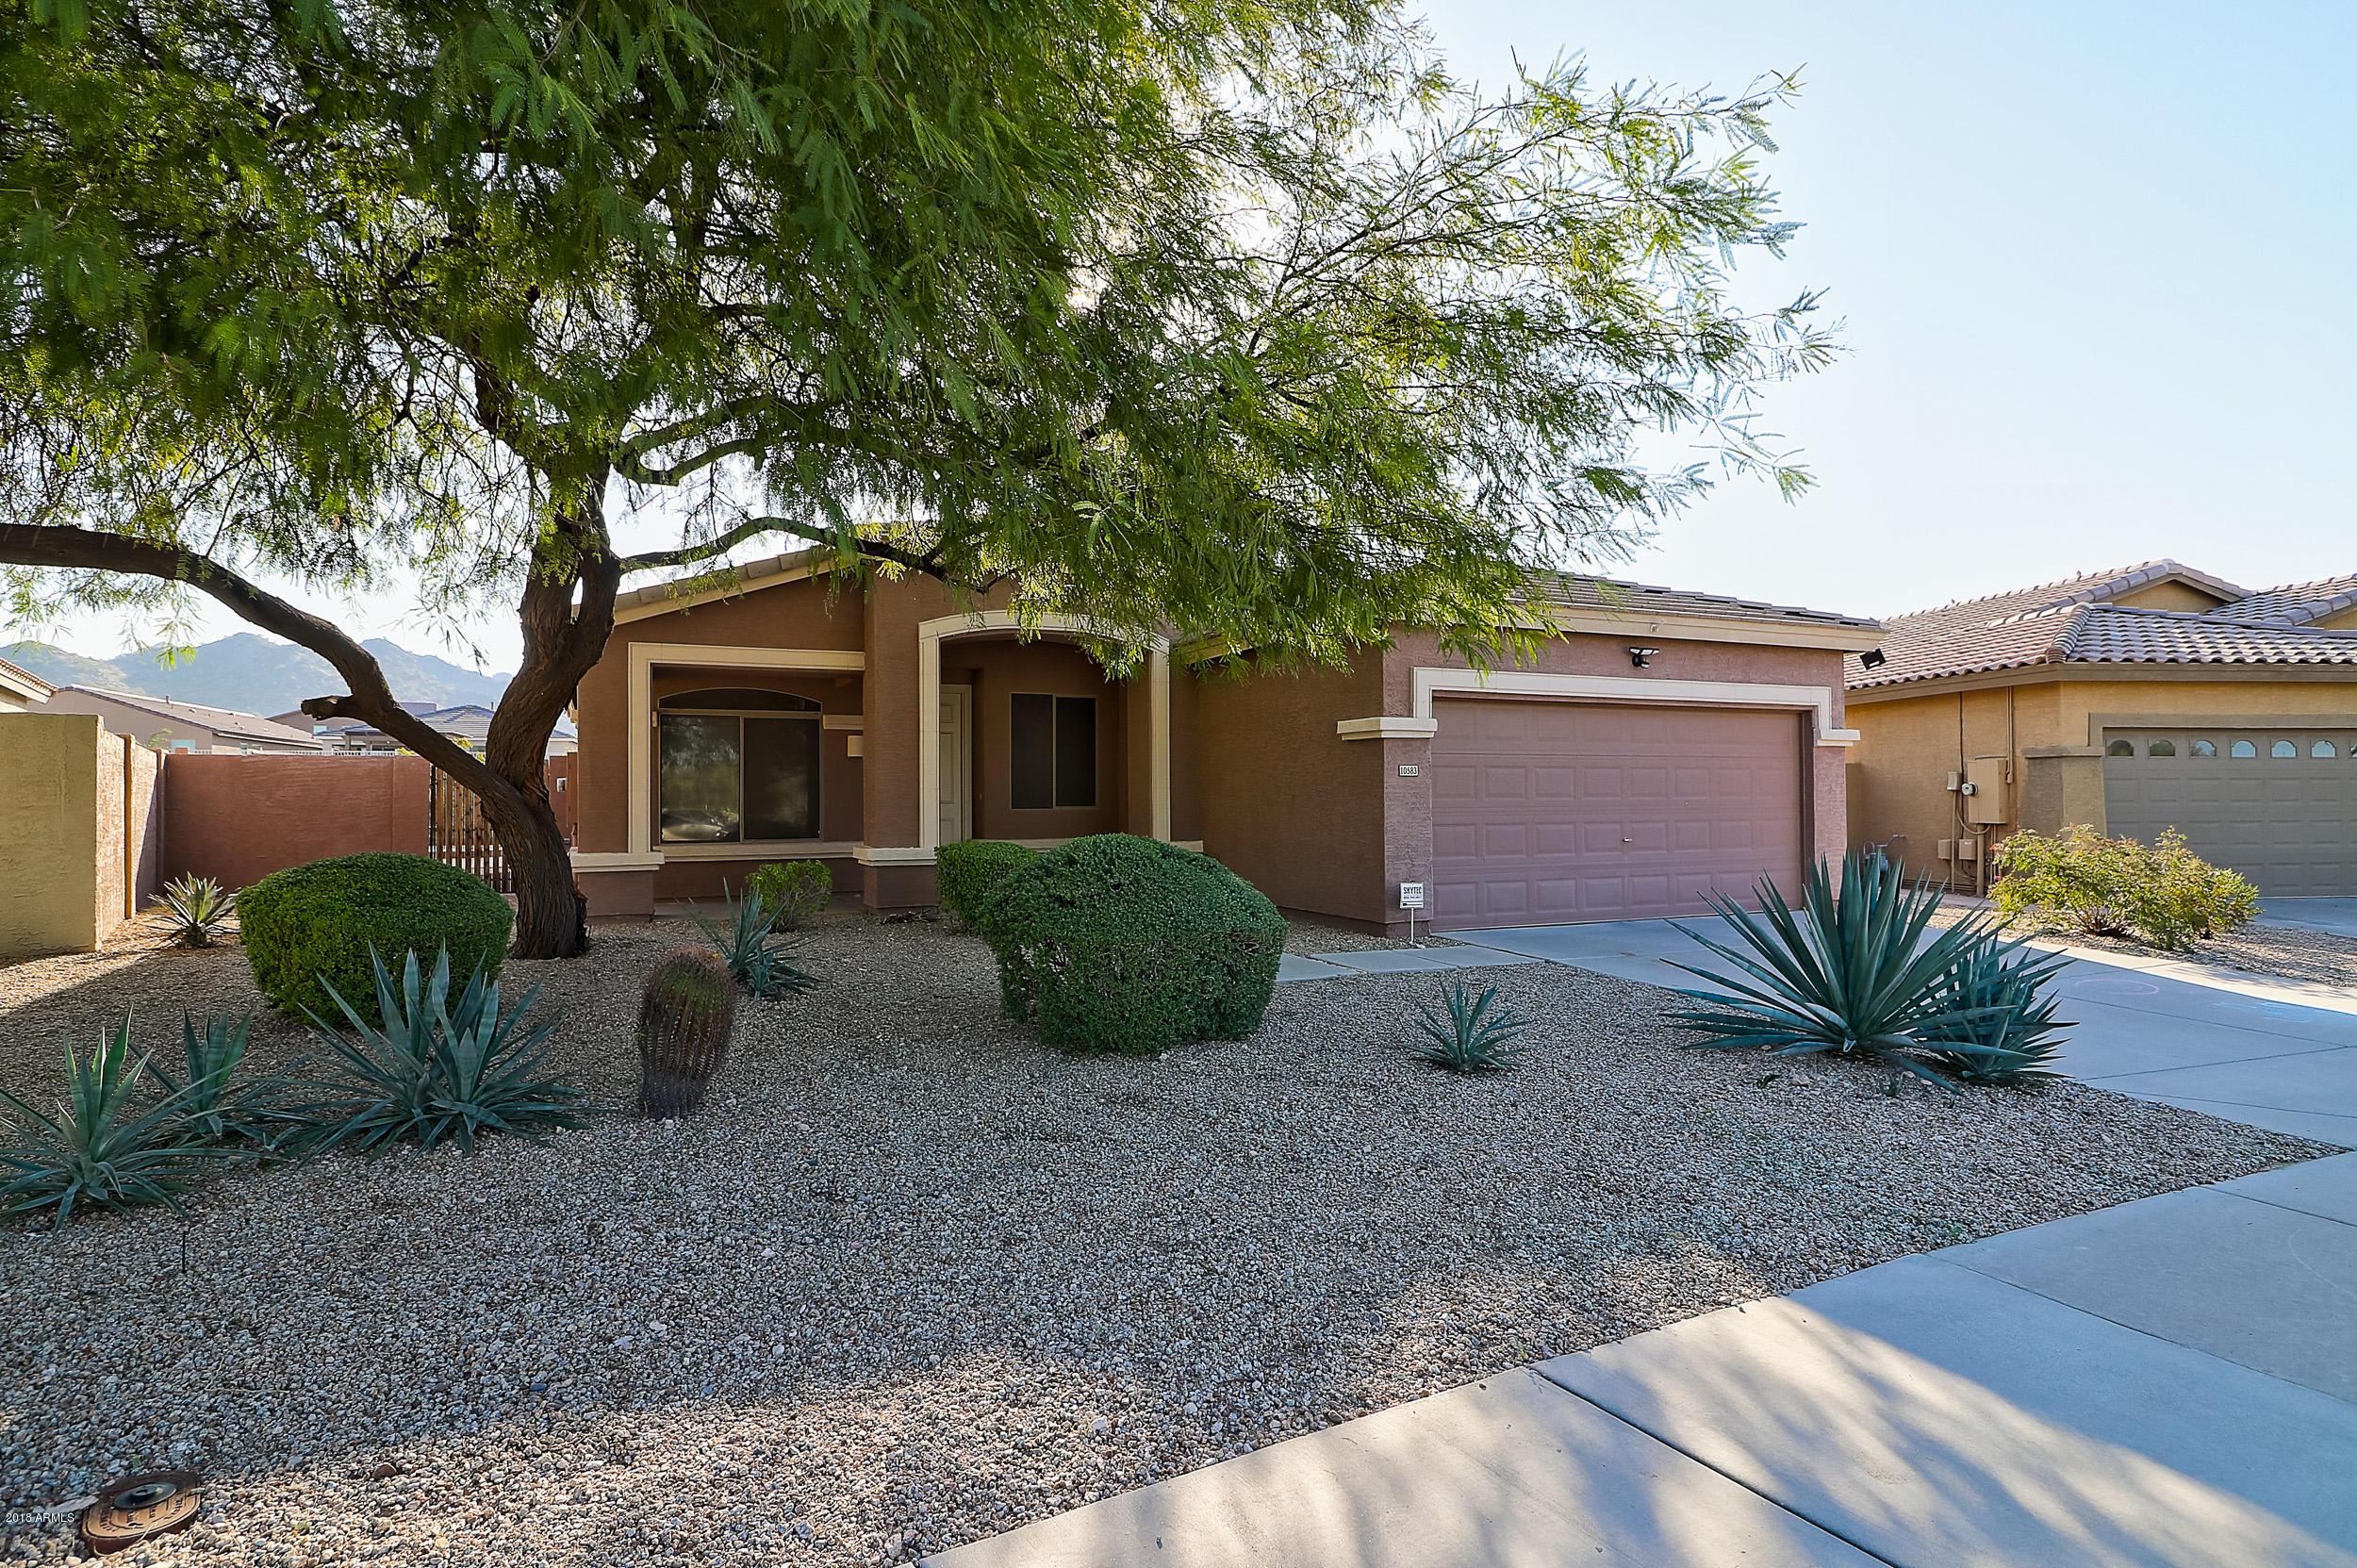 Photo of 10583 S 175TH Avenue, Goodyear, AZ 85338